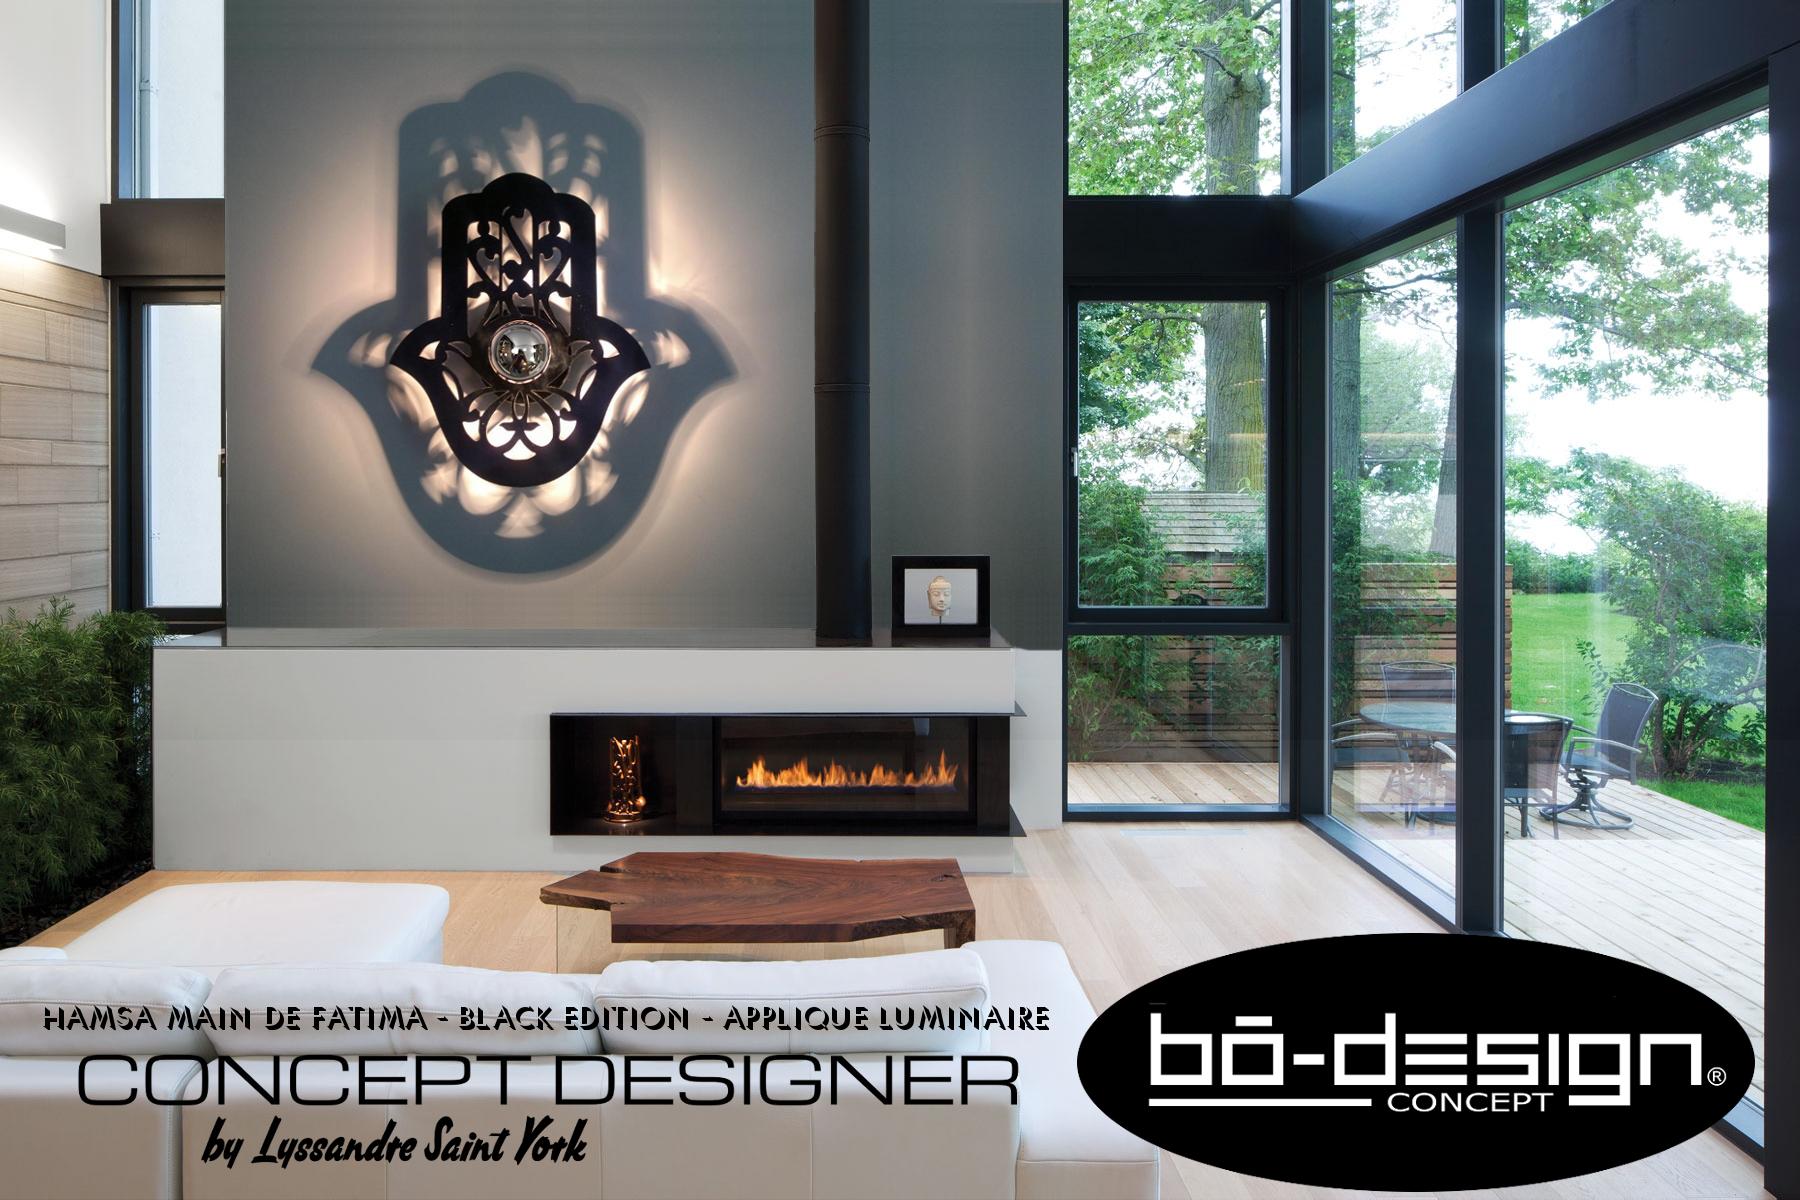 luminaire design bodesignconcept. Black Bedroom Furniture Sets. Home Design Ideas